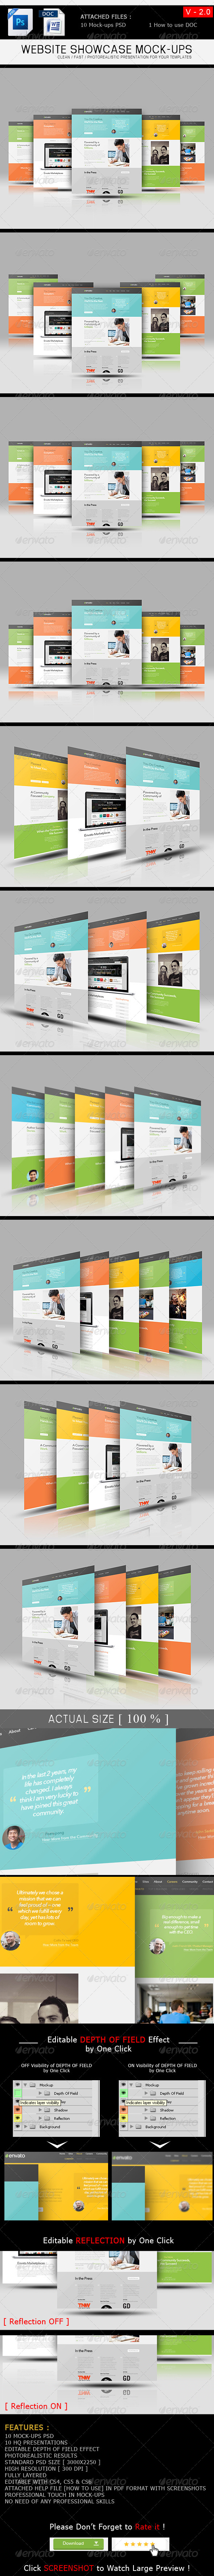 GraphicRiver Website Showcase Mockups V 2.0 6822433